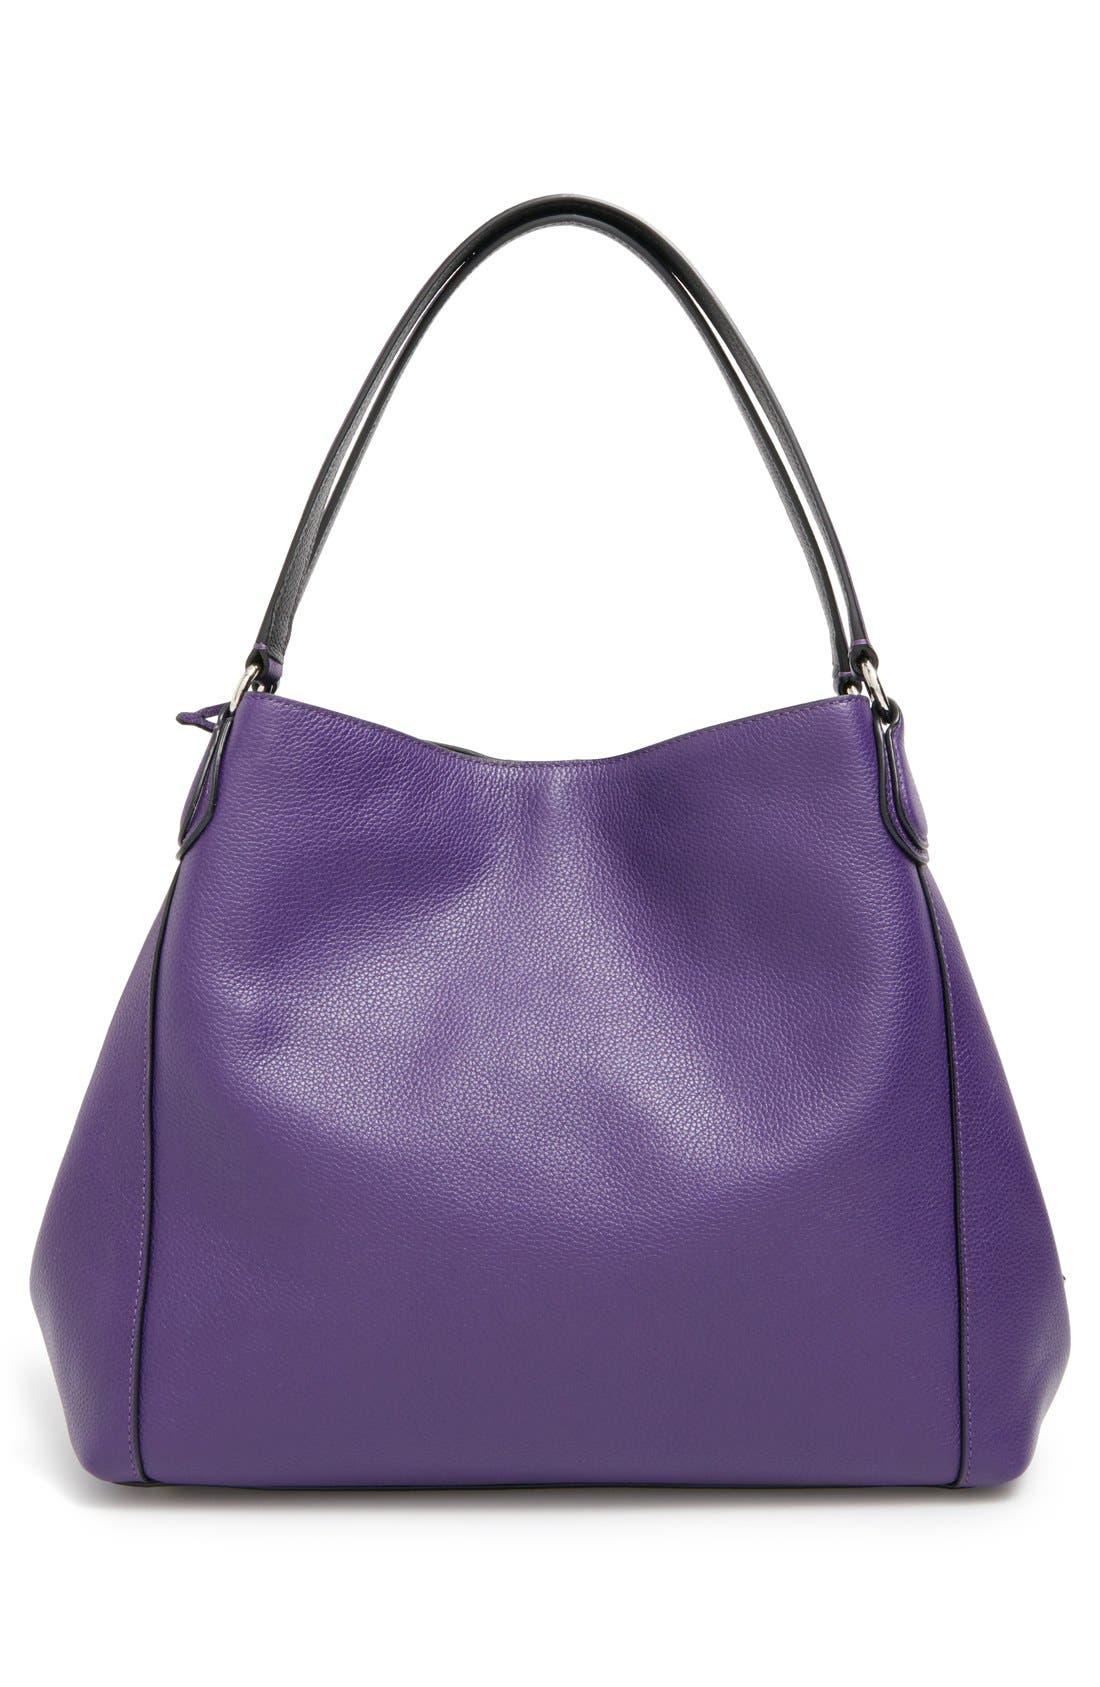 COACH,                             'Edie 31' Pebbled Leather Shoulder Bag,                             Alternate thumbnail 6, color,                             500